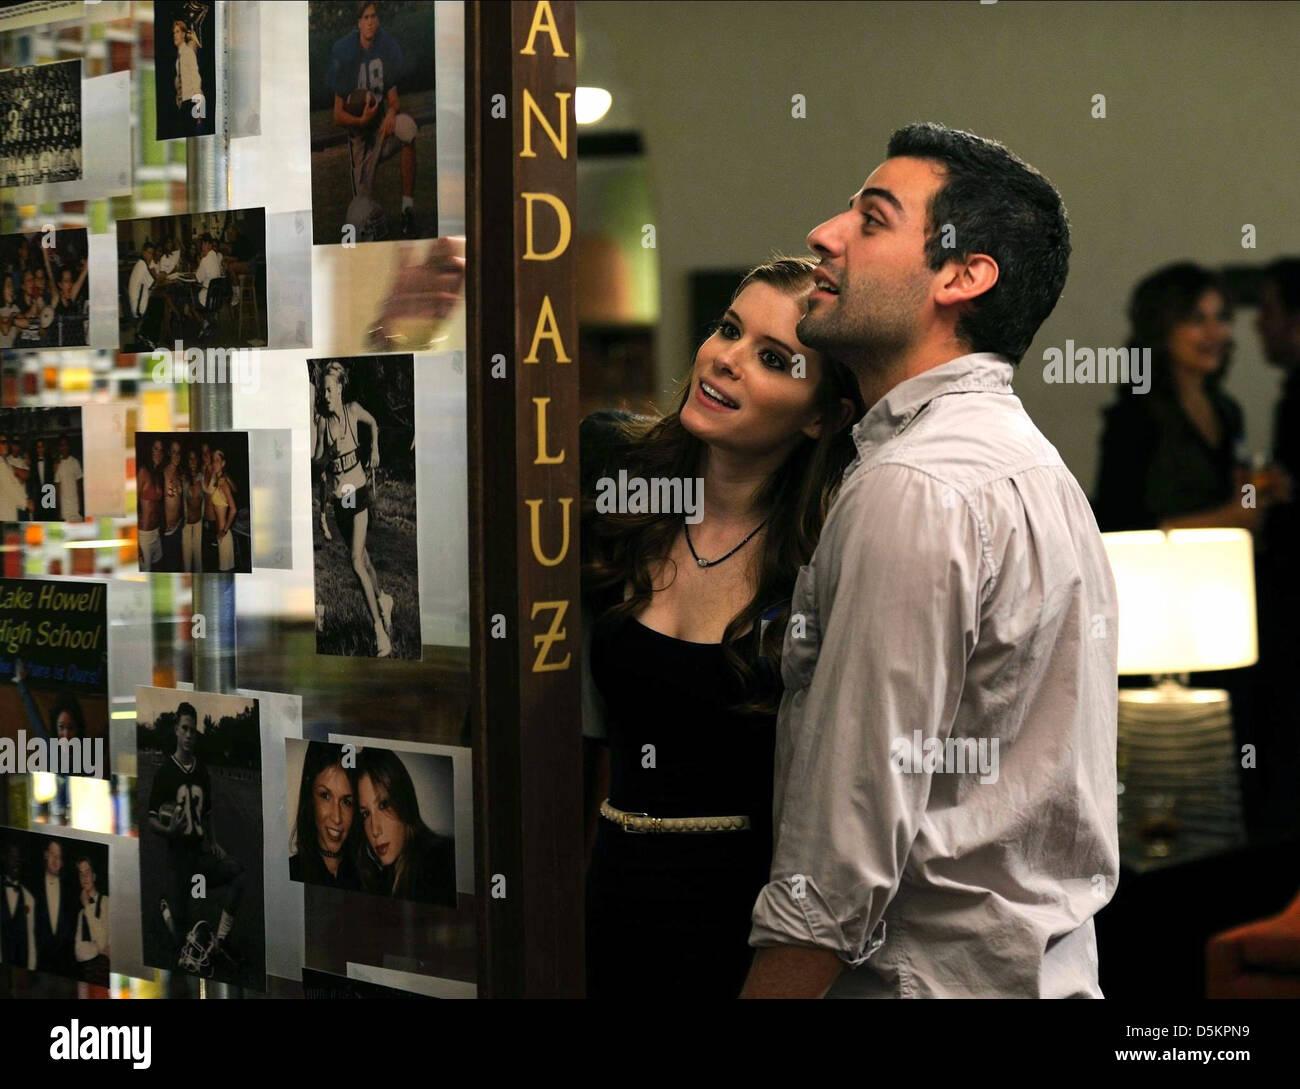 KATE MARA & OSCAR ISAAC 10 YEARS (2011) - Stock Image